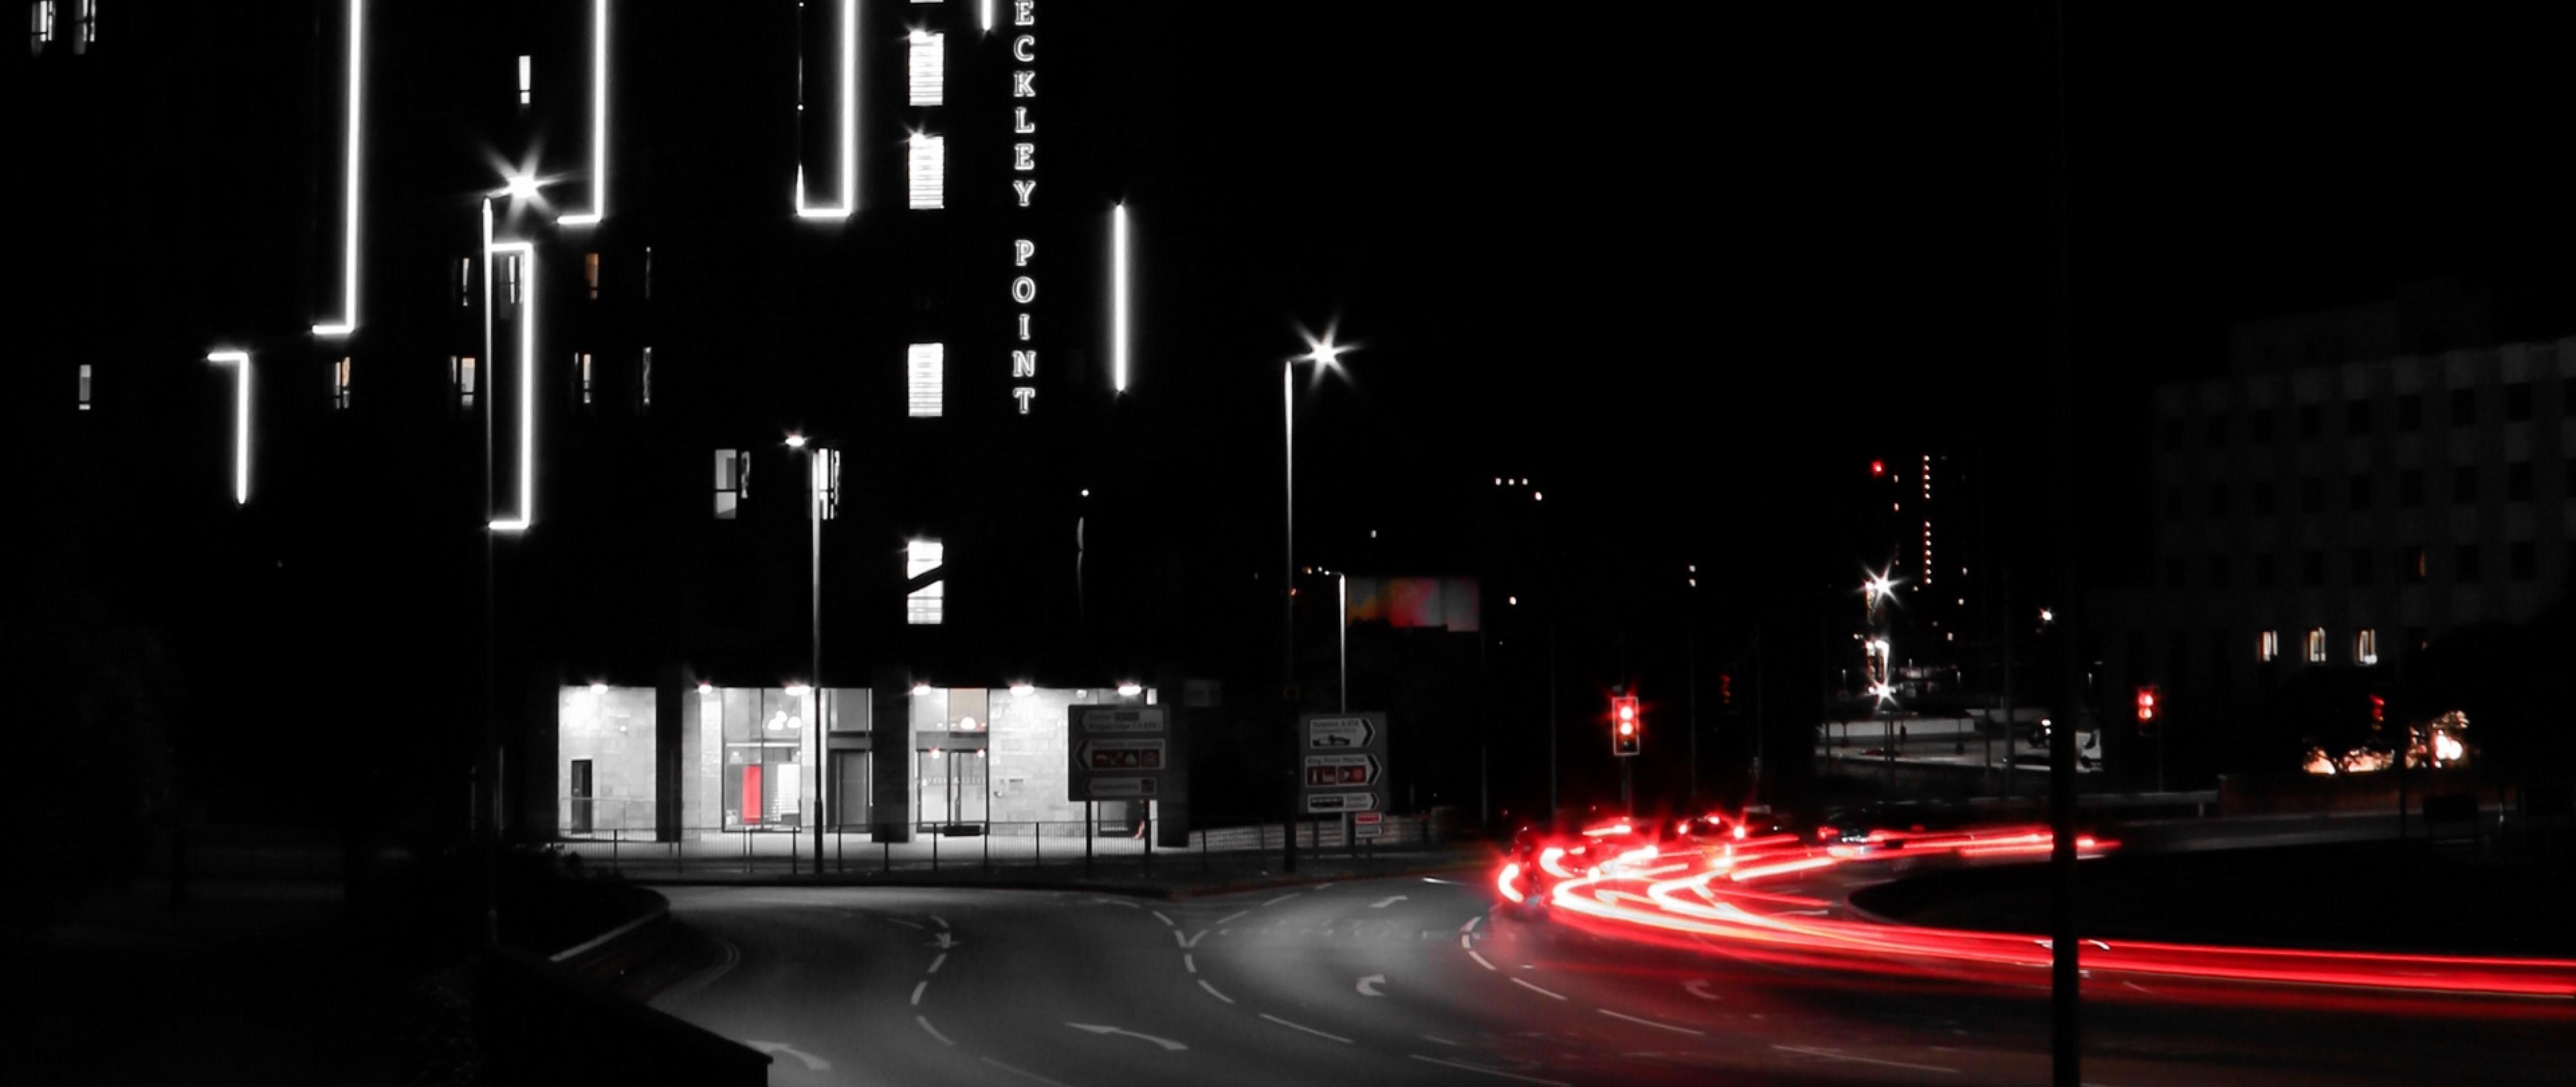 Street Light At The City Hd Wallpaper 4k Ultra Hd Wide Tv